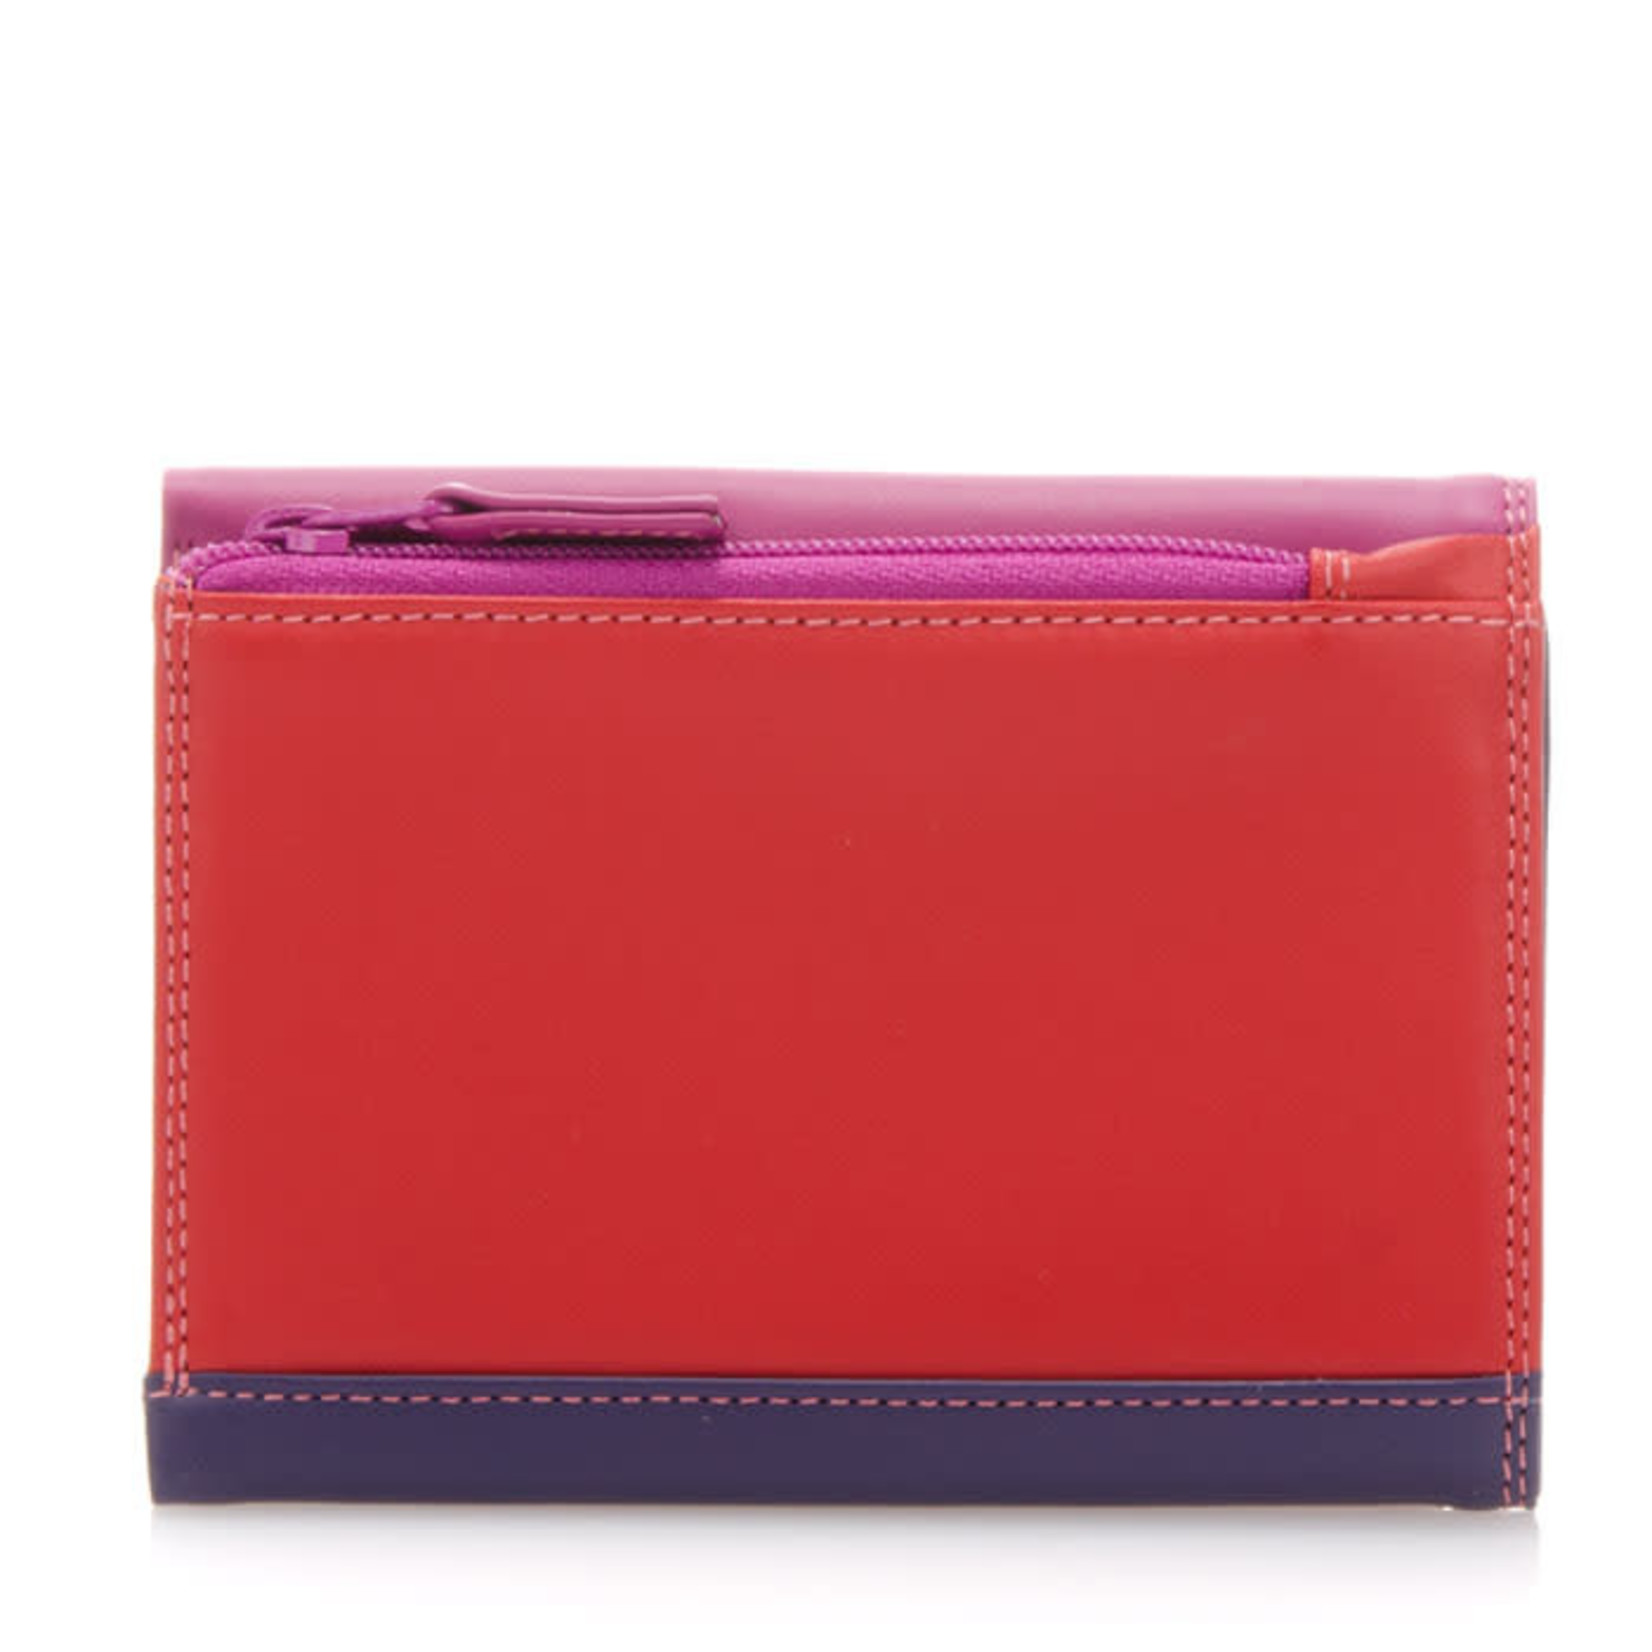 MyWalit Medium Tri-fold Wallet Sangria Multi